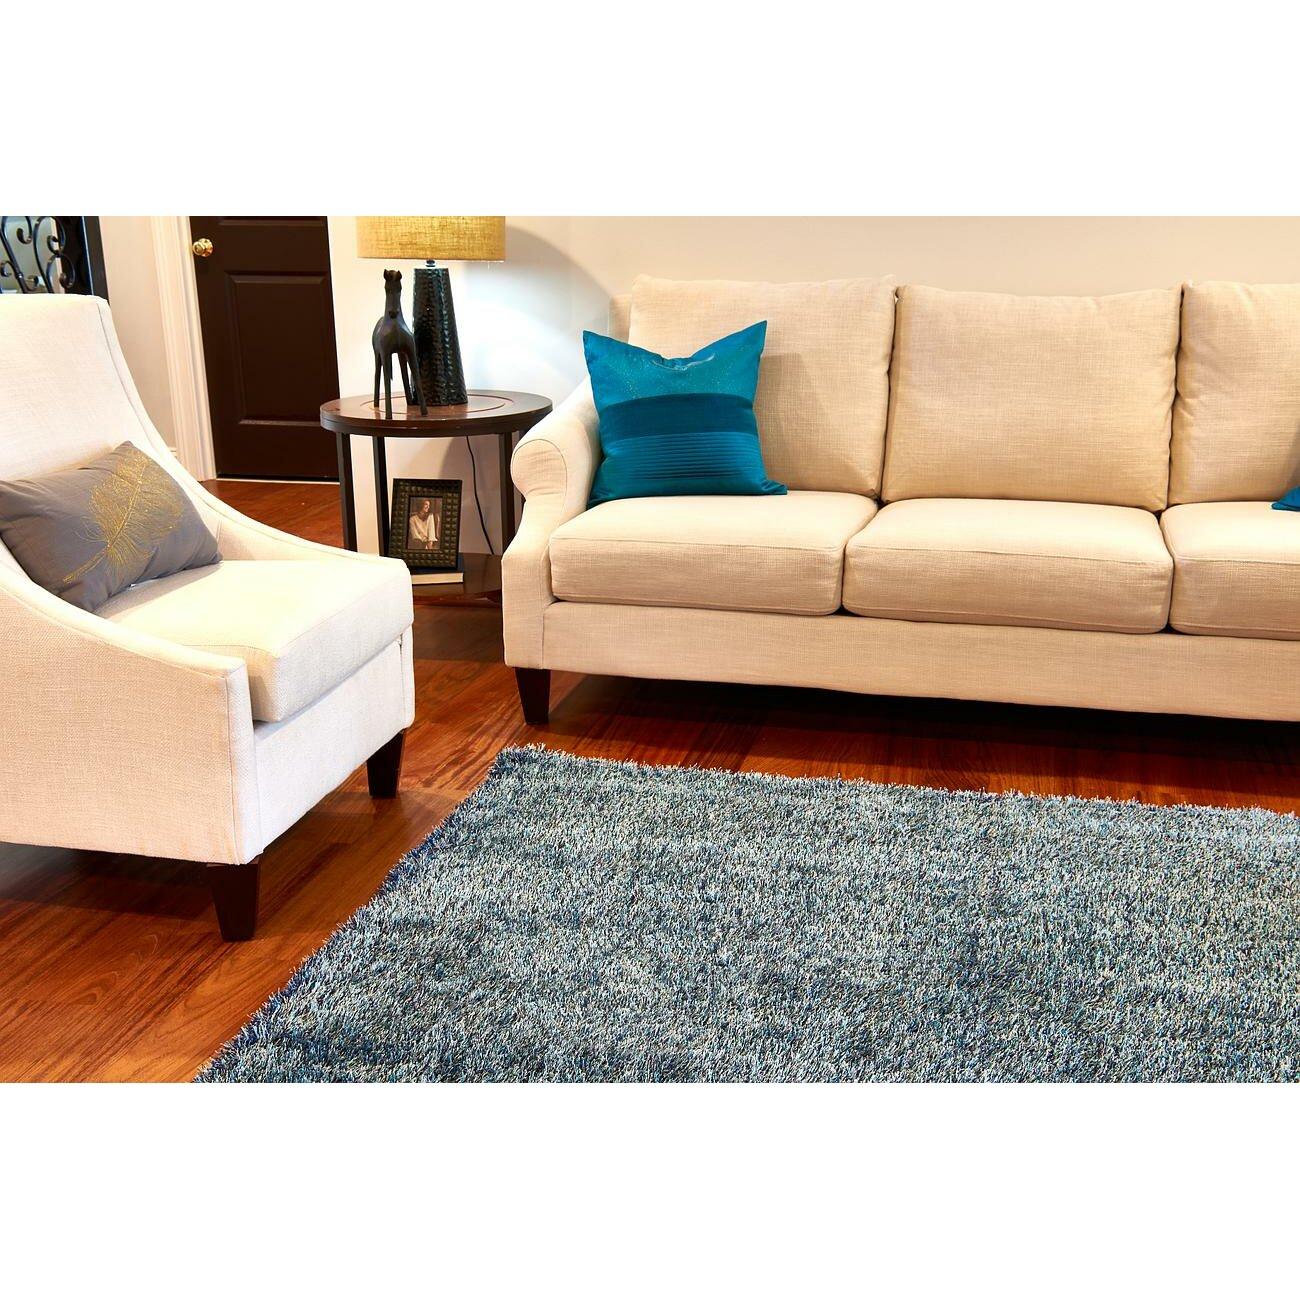 Varick gallery boice navy blue area rug